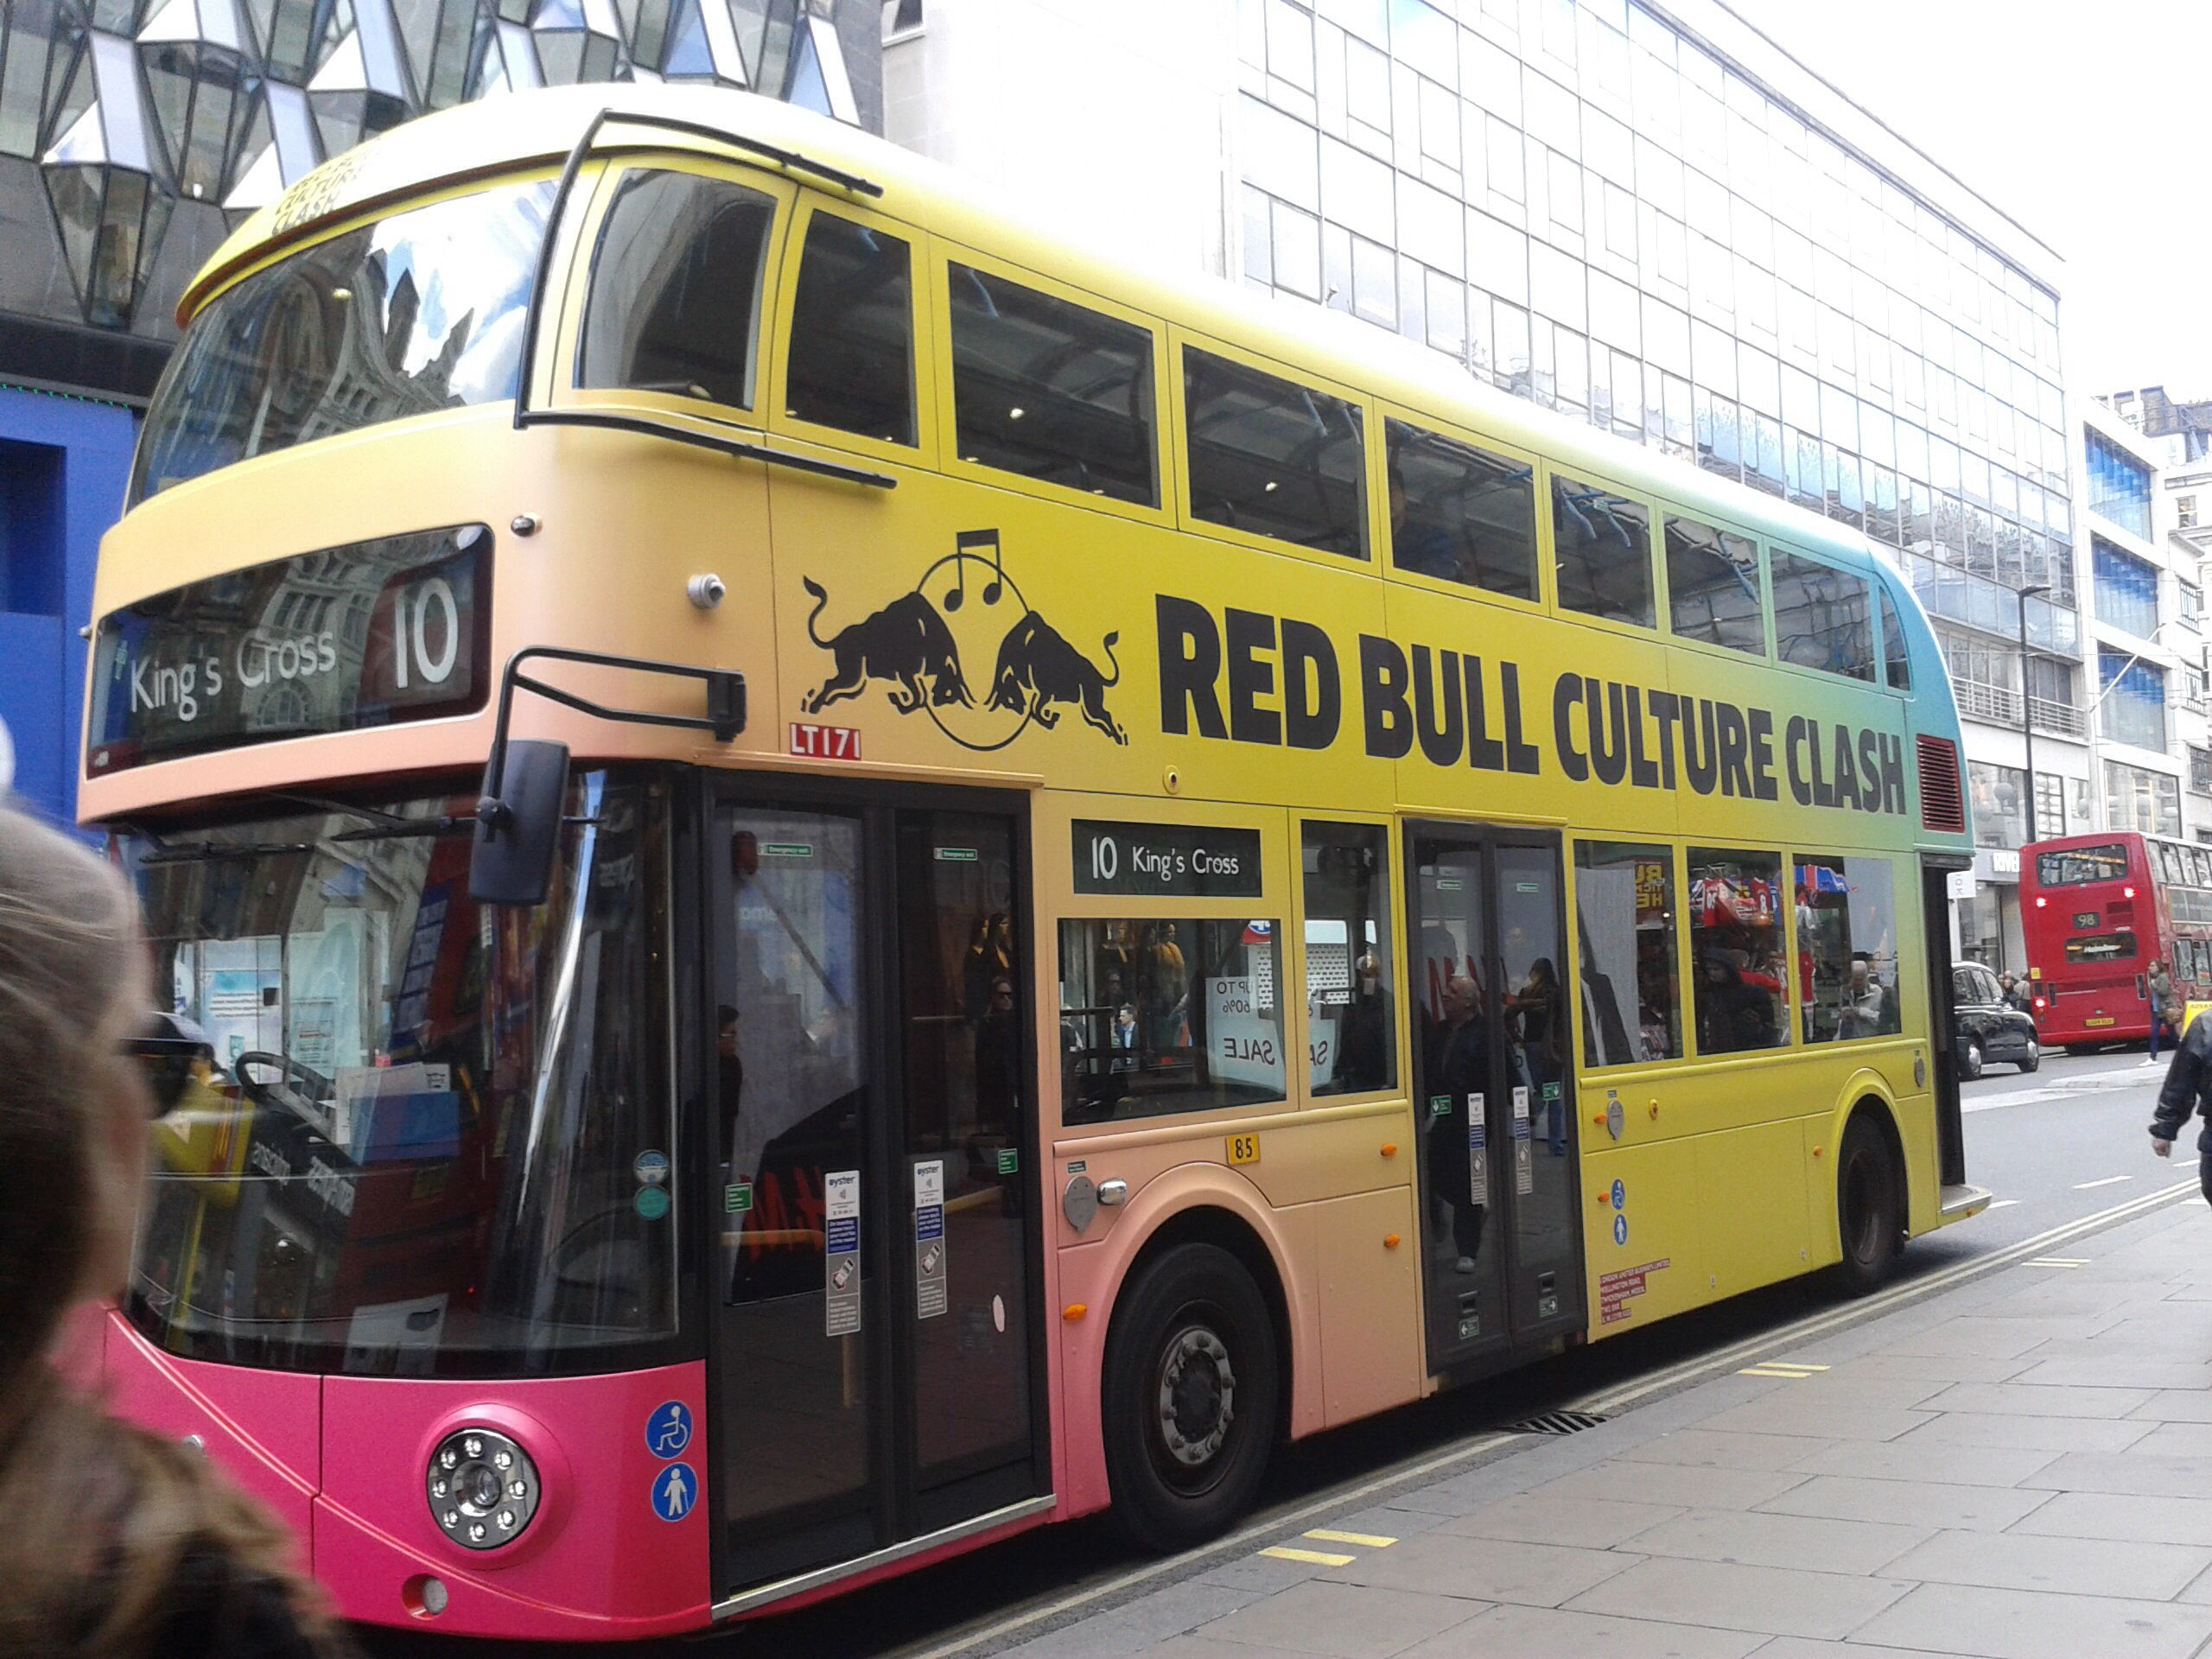 Red Bull advertising on London's bus